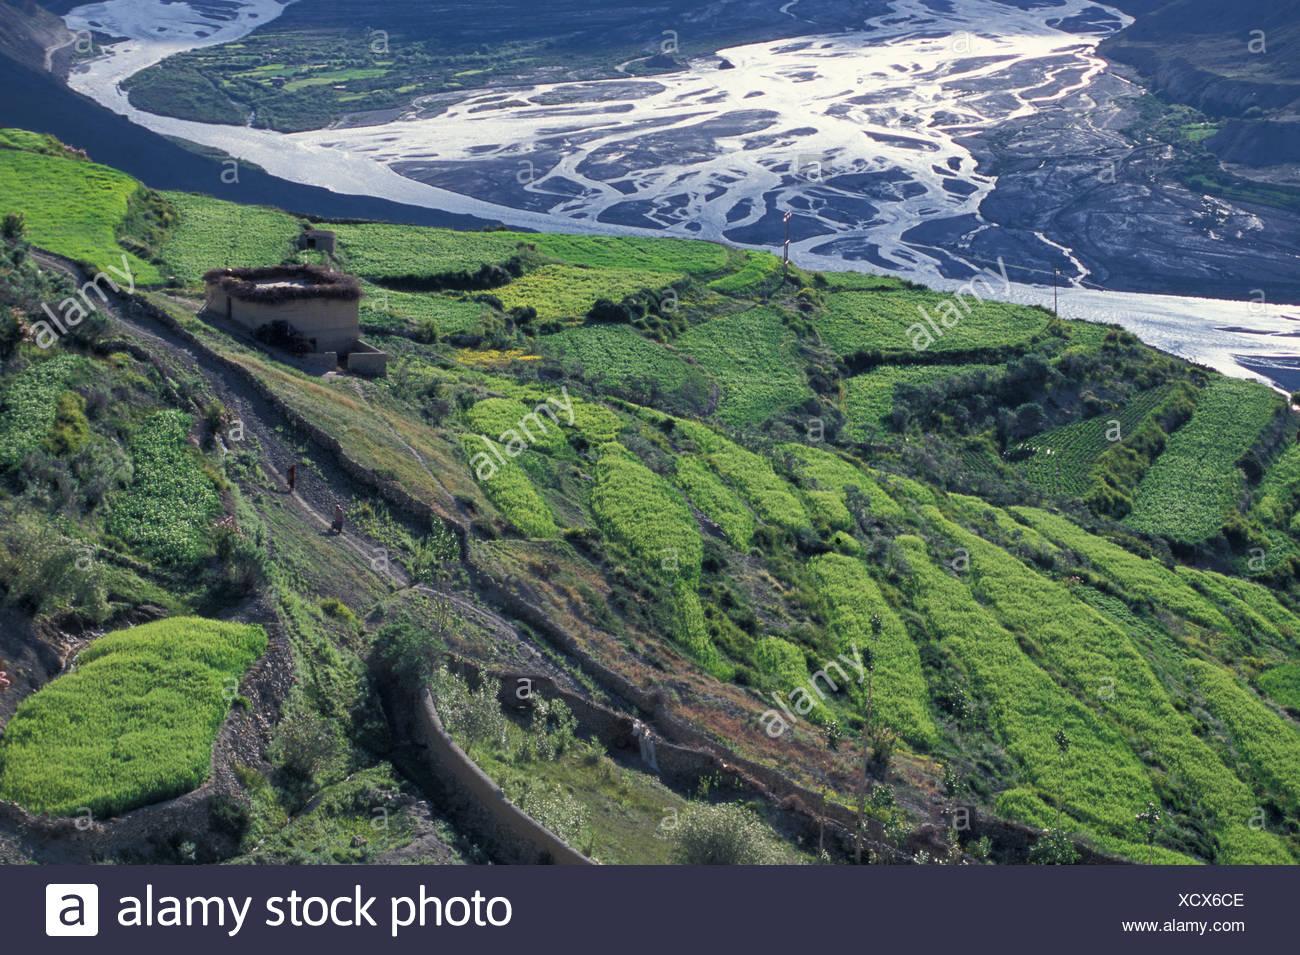 Fields, Dhankar, Spiti, Himachal Pradesh, Himalaya, North India, India, Asia - Stock Image